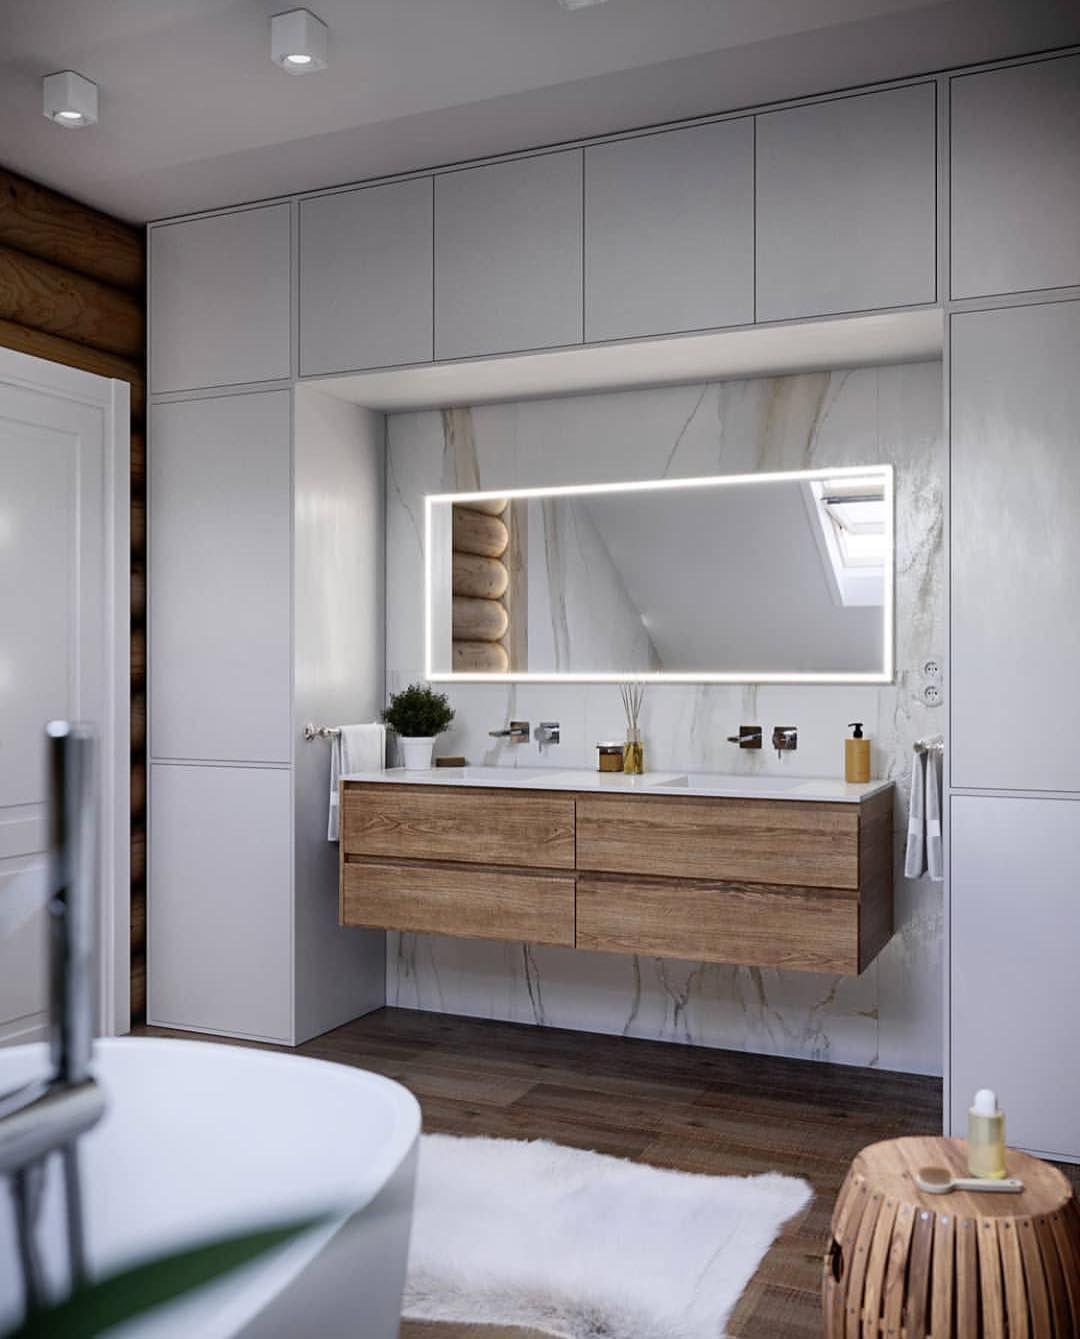 Trendy 13 Beegcom Top Interior Design Companies To Work For Home Decor Online Home Decor Home Wall Decor